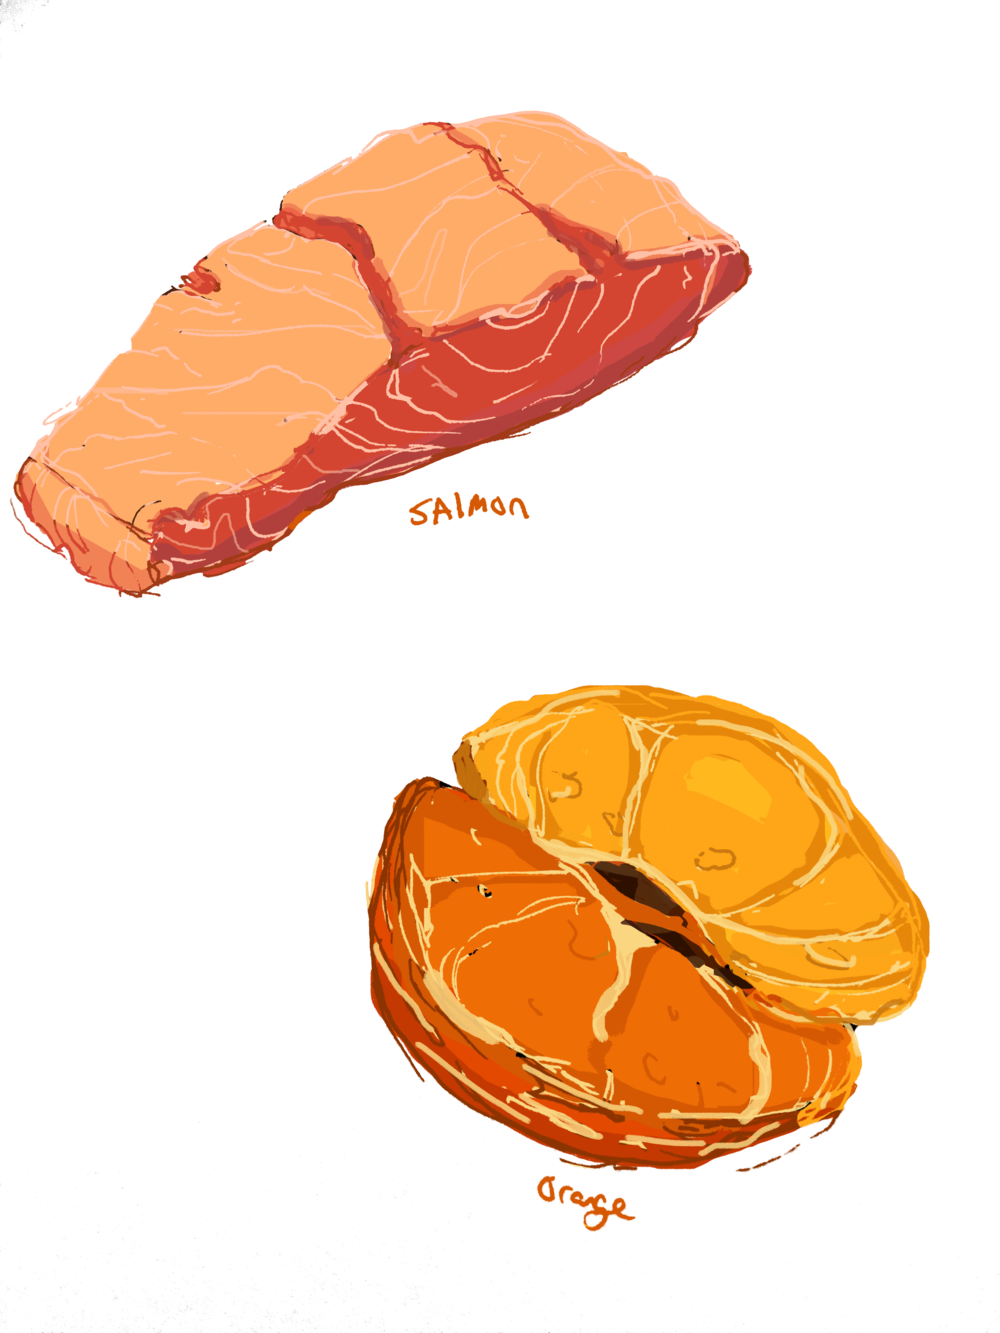 Salmonandorange.png